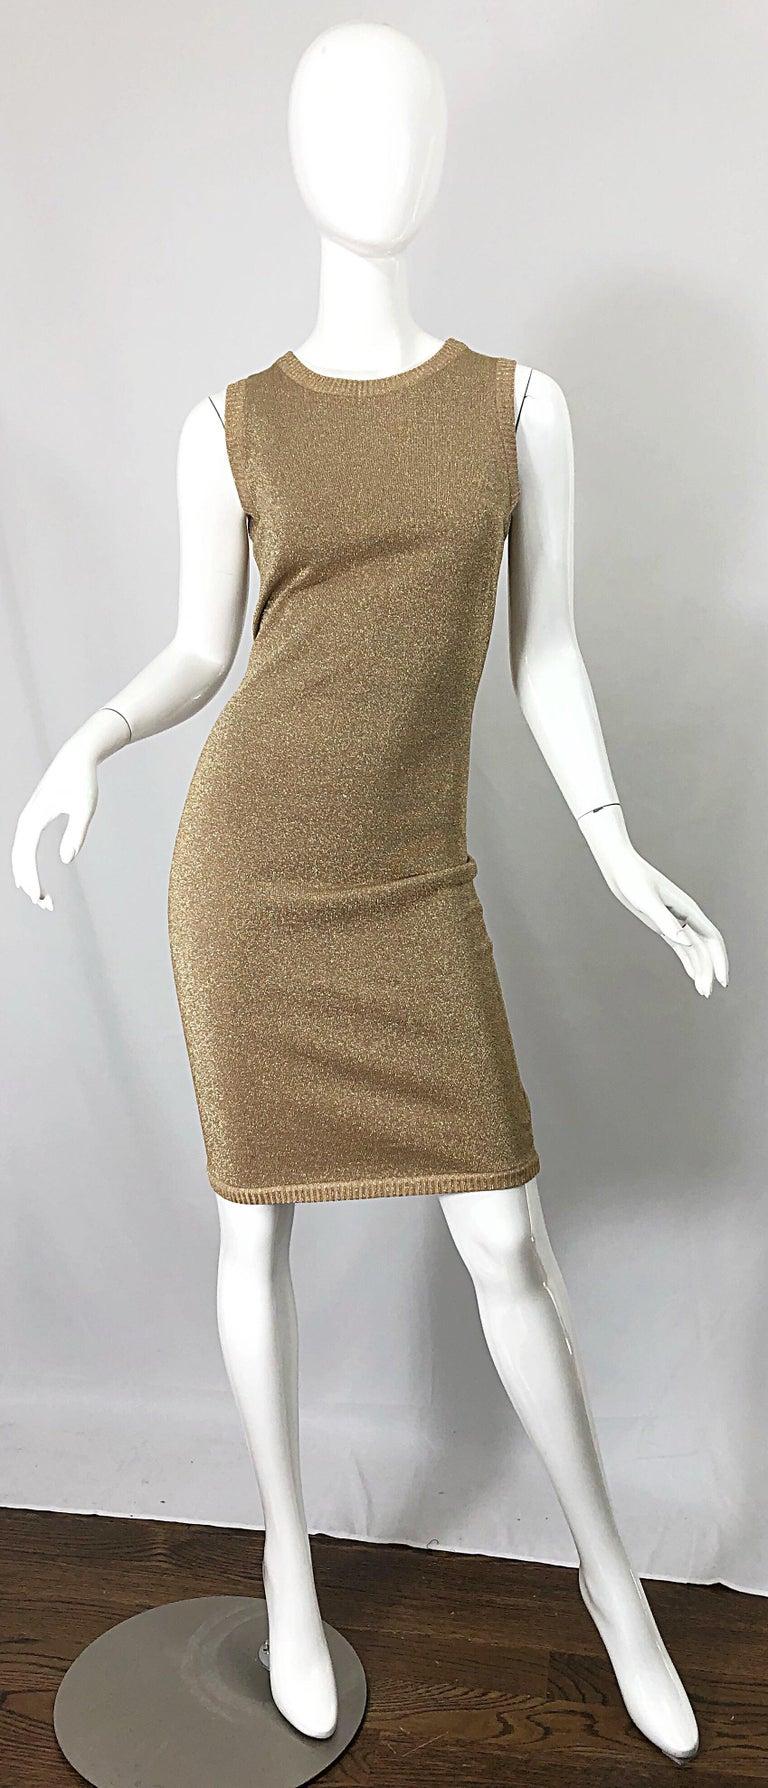 Mila Schoon 1990s Gold Metallic Cut - Out Back Vintage 90s Bodycon Dress For Sale 8